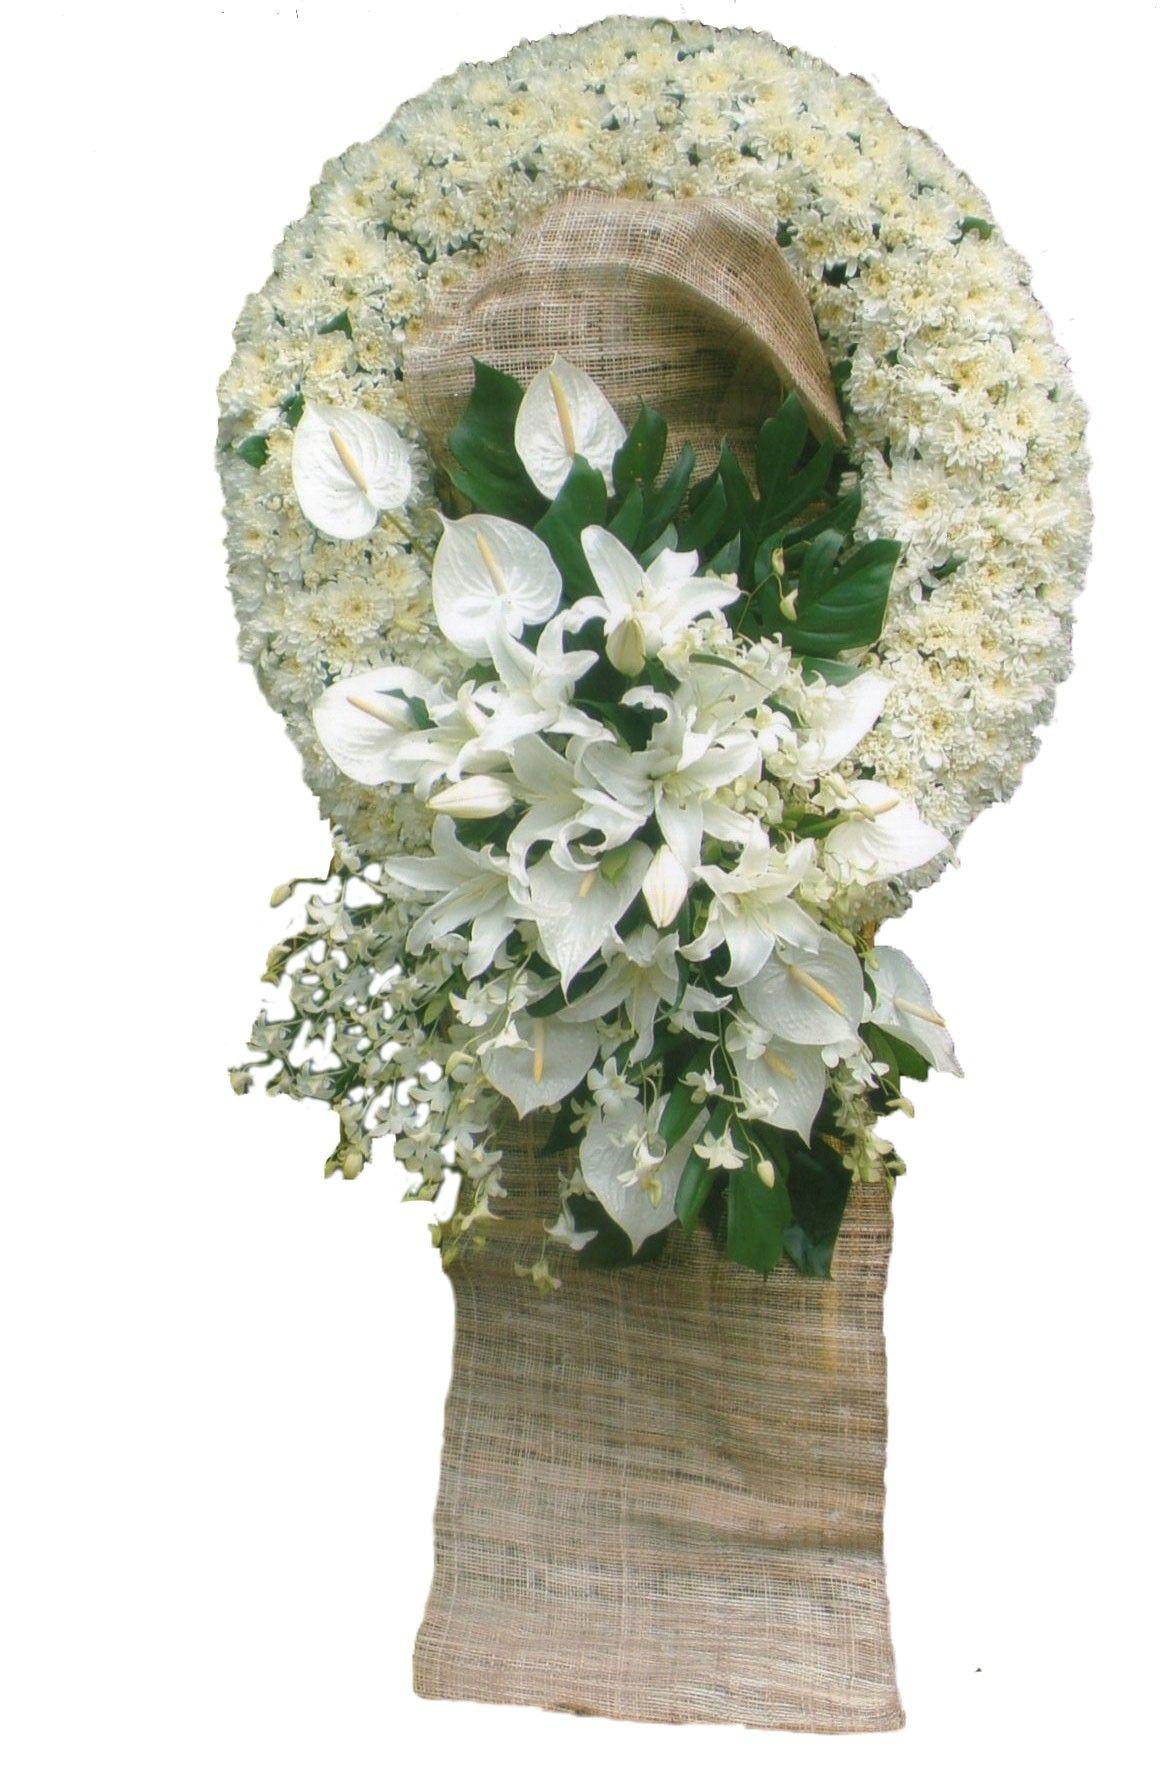 Funeral flower arrangement spiritual bliss sympathy funeral funeral flower arrangement spiritual bliss sympathy izmirmasajfo